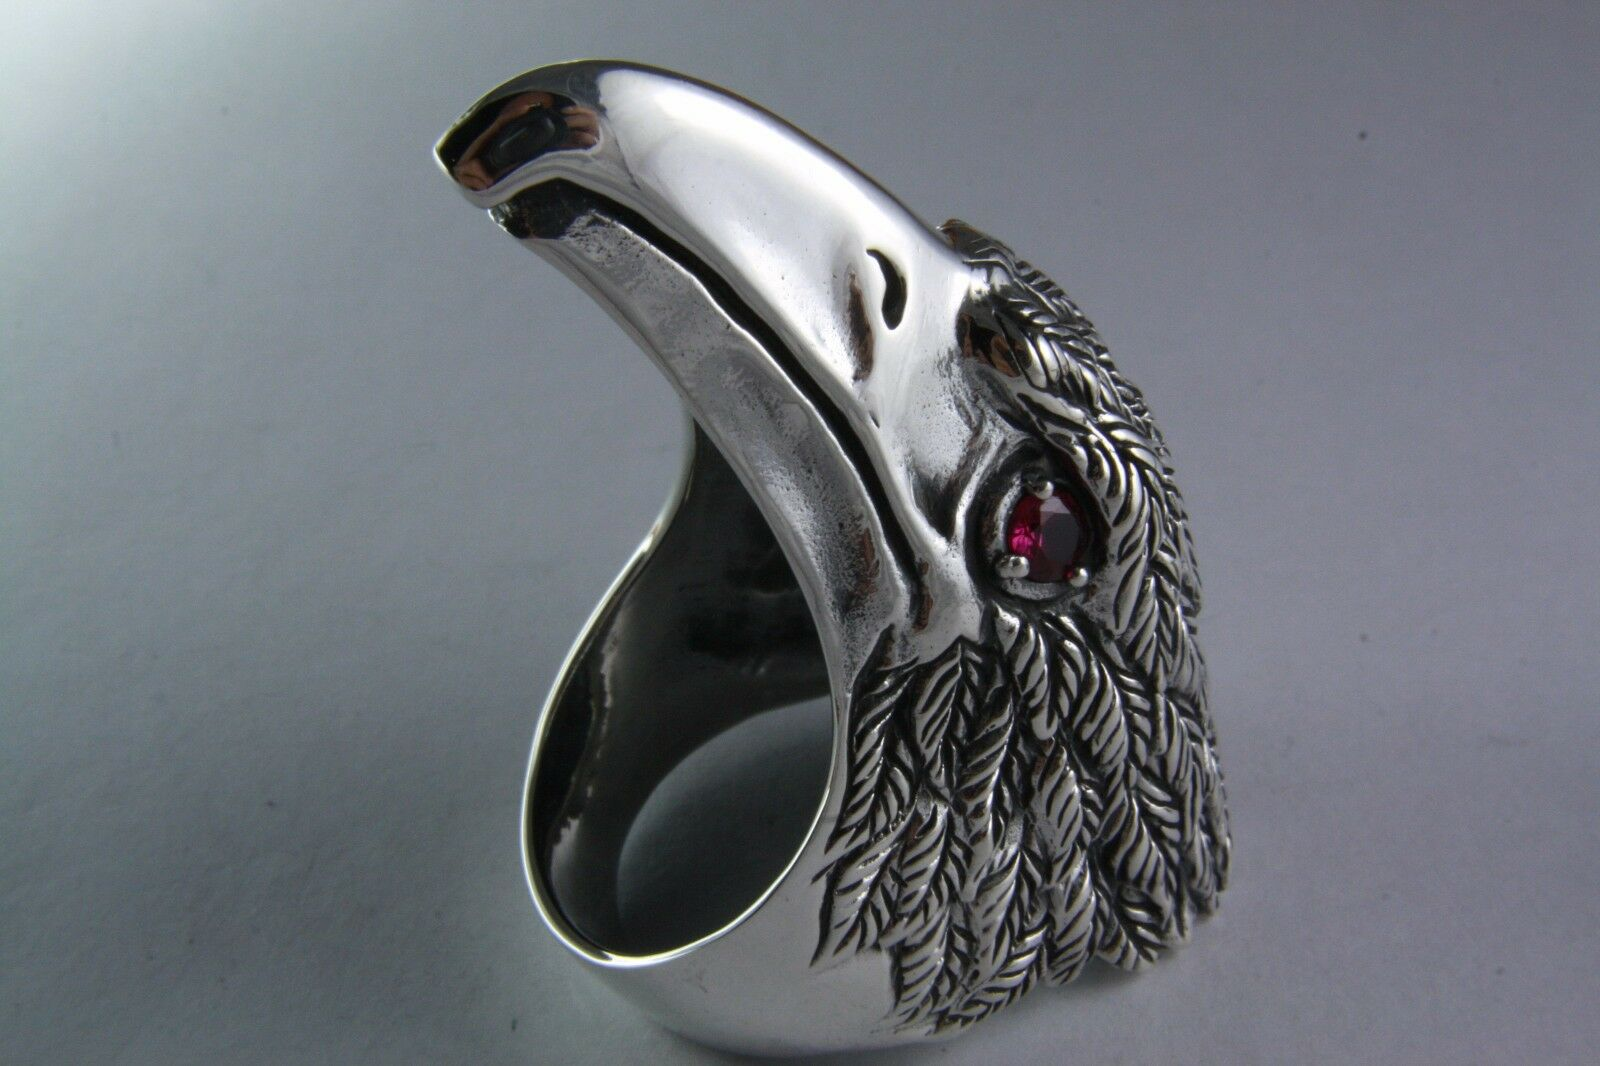 ADLER RING EAGLE MOTORRAD BIKER CHOPPER silverRING 925 silver   421